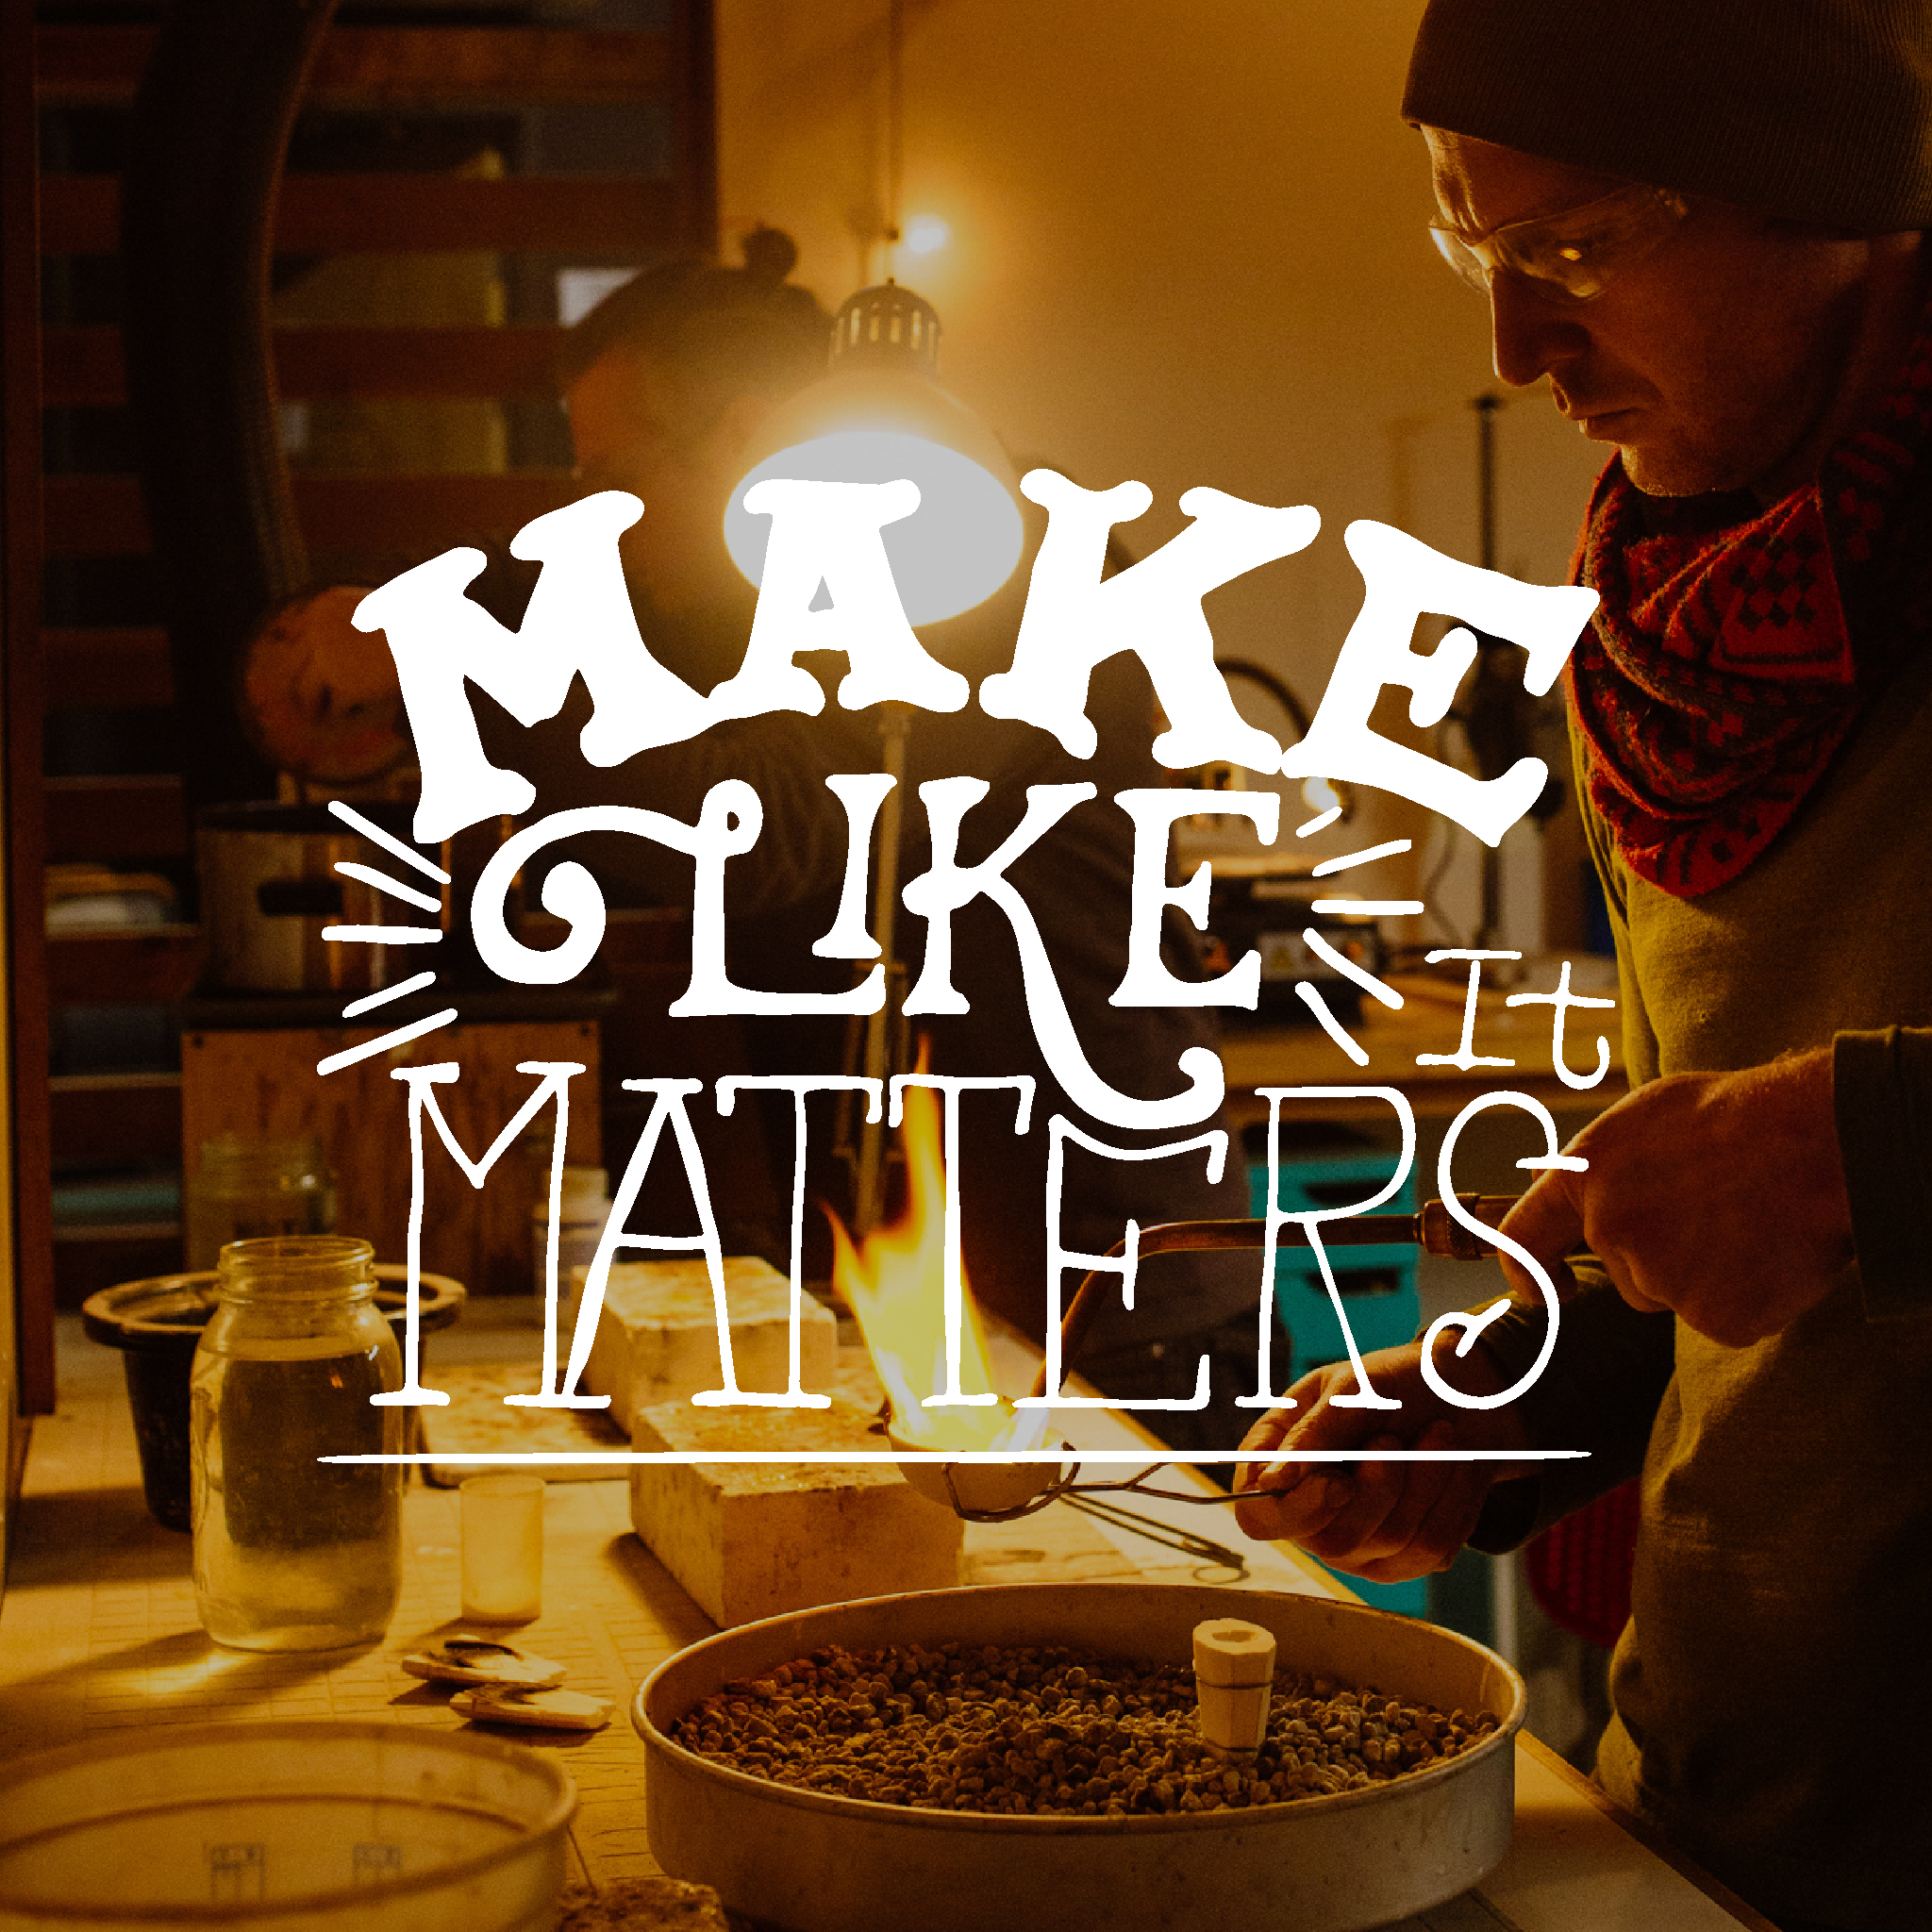 ADX_Make_Like_It_Matters_1A_r32__2048x2048.jpg